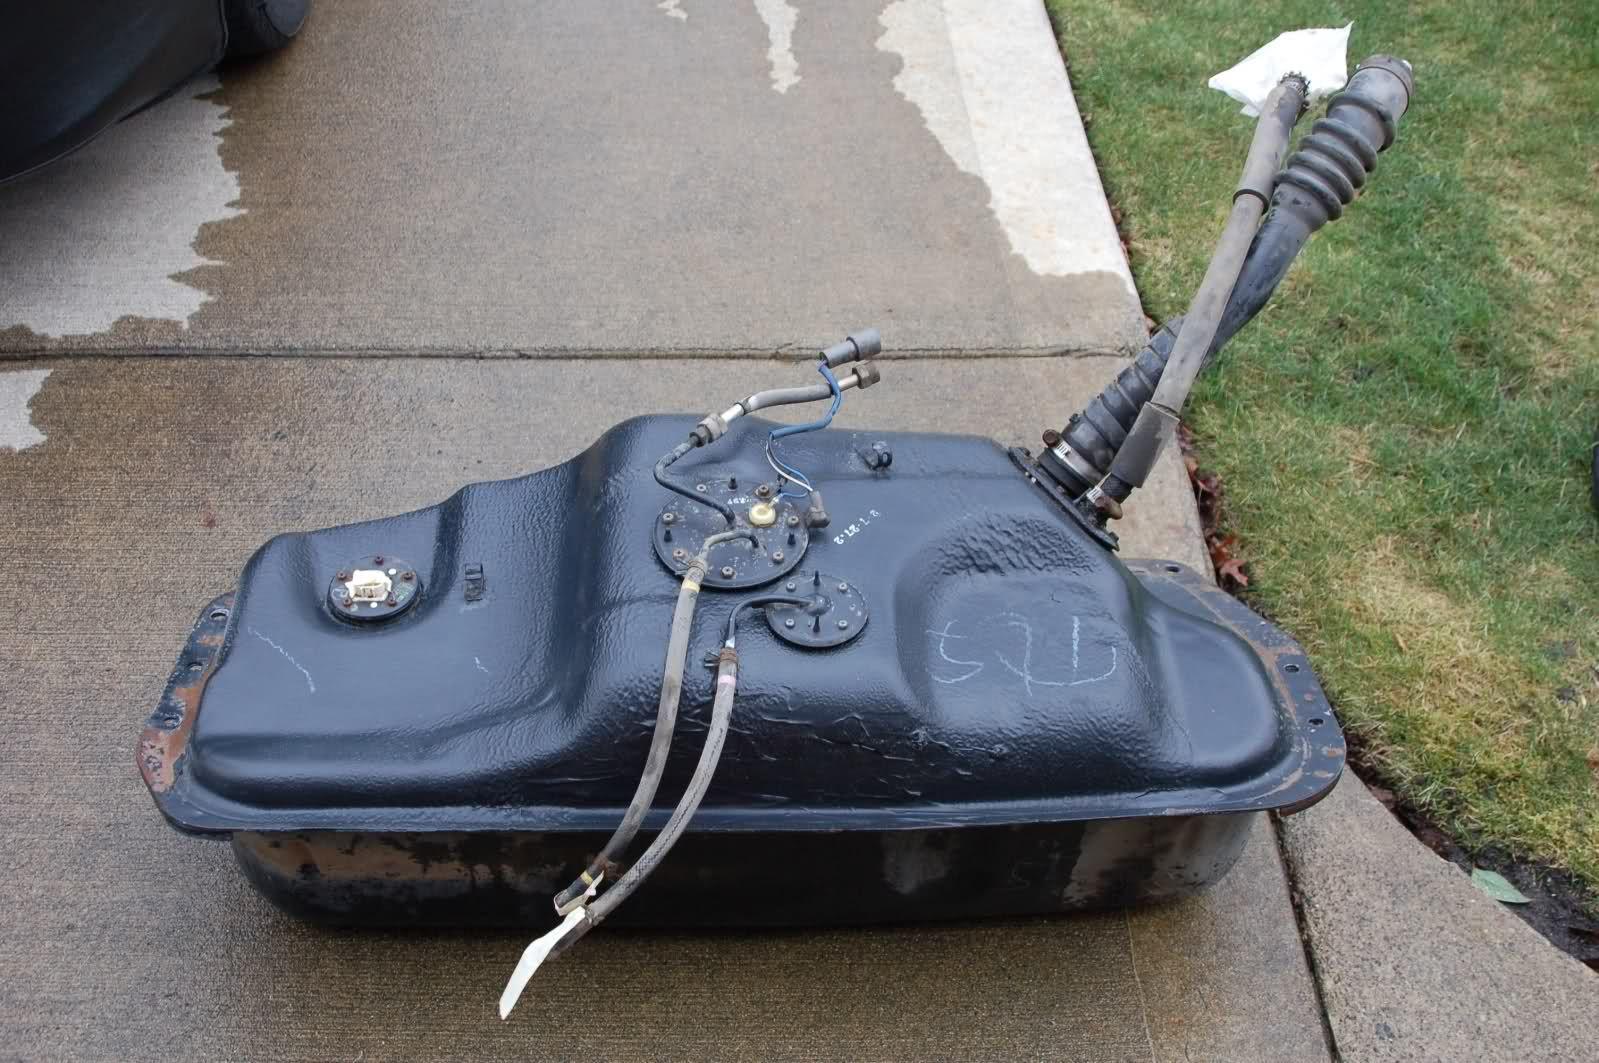 3vze fuel pump replacement in process pics toyota 4runner forum largest [ 1599 x 1063 Pixel ]